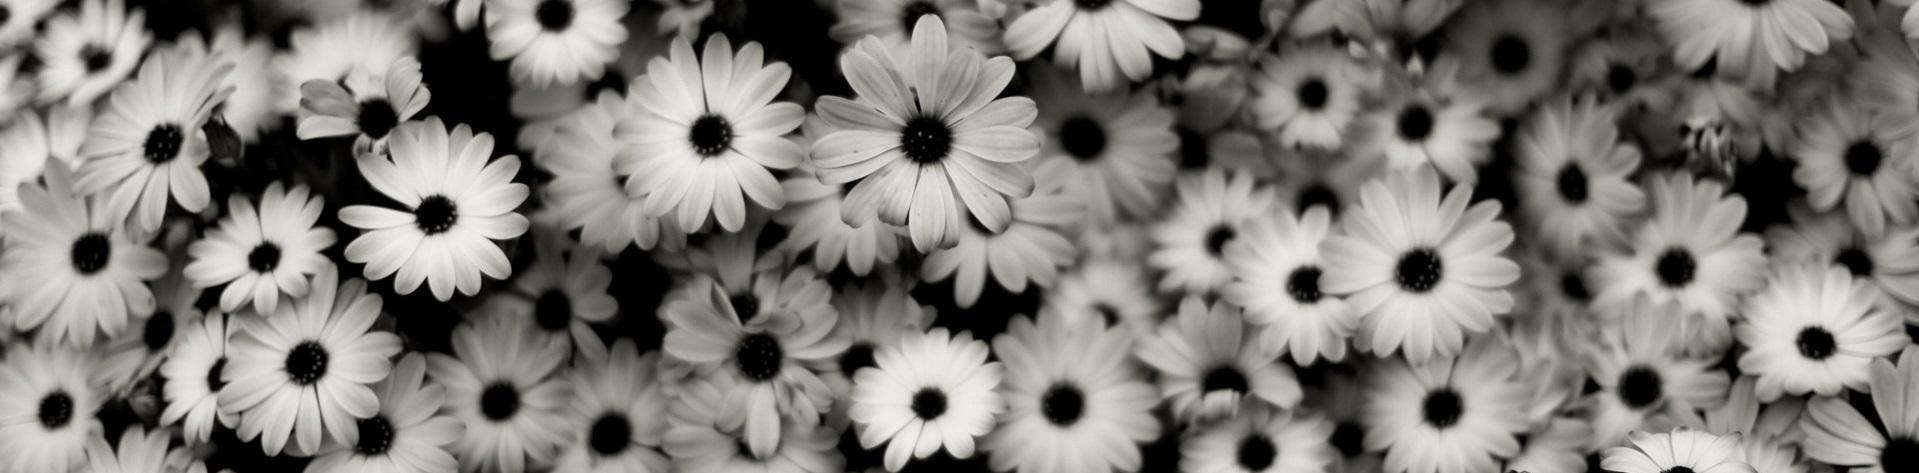 Flower size tumblr erkalnathandedecker image black and white background tumblr flowers mzqin2bq jpg the mightylinksfo